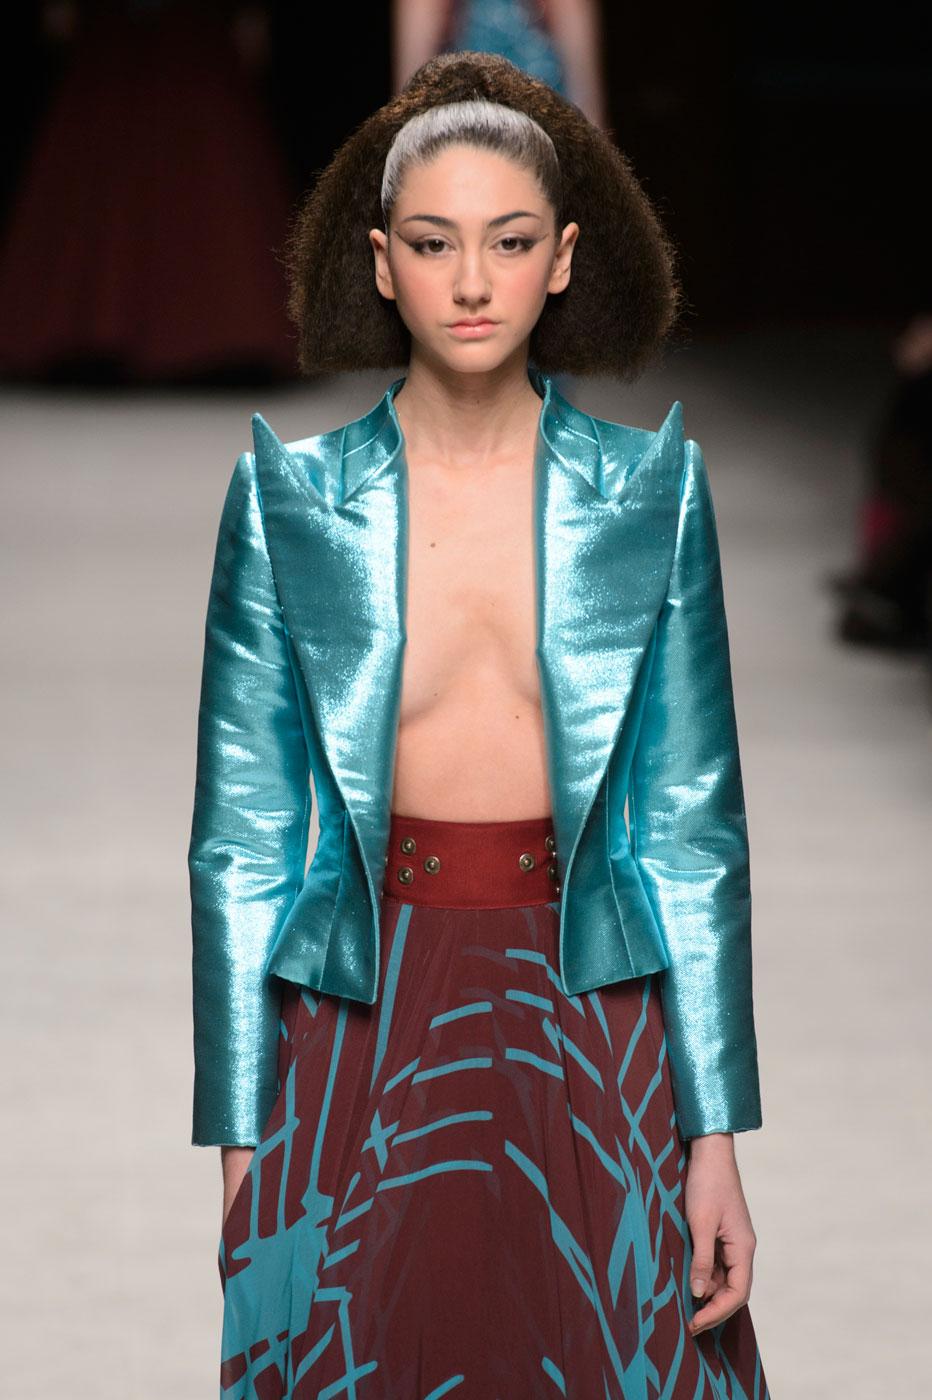 Julien-Fournie-Prive-fashion-runway-show-haute-couture-paris-spring-2015-the-impression-47